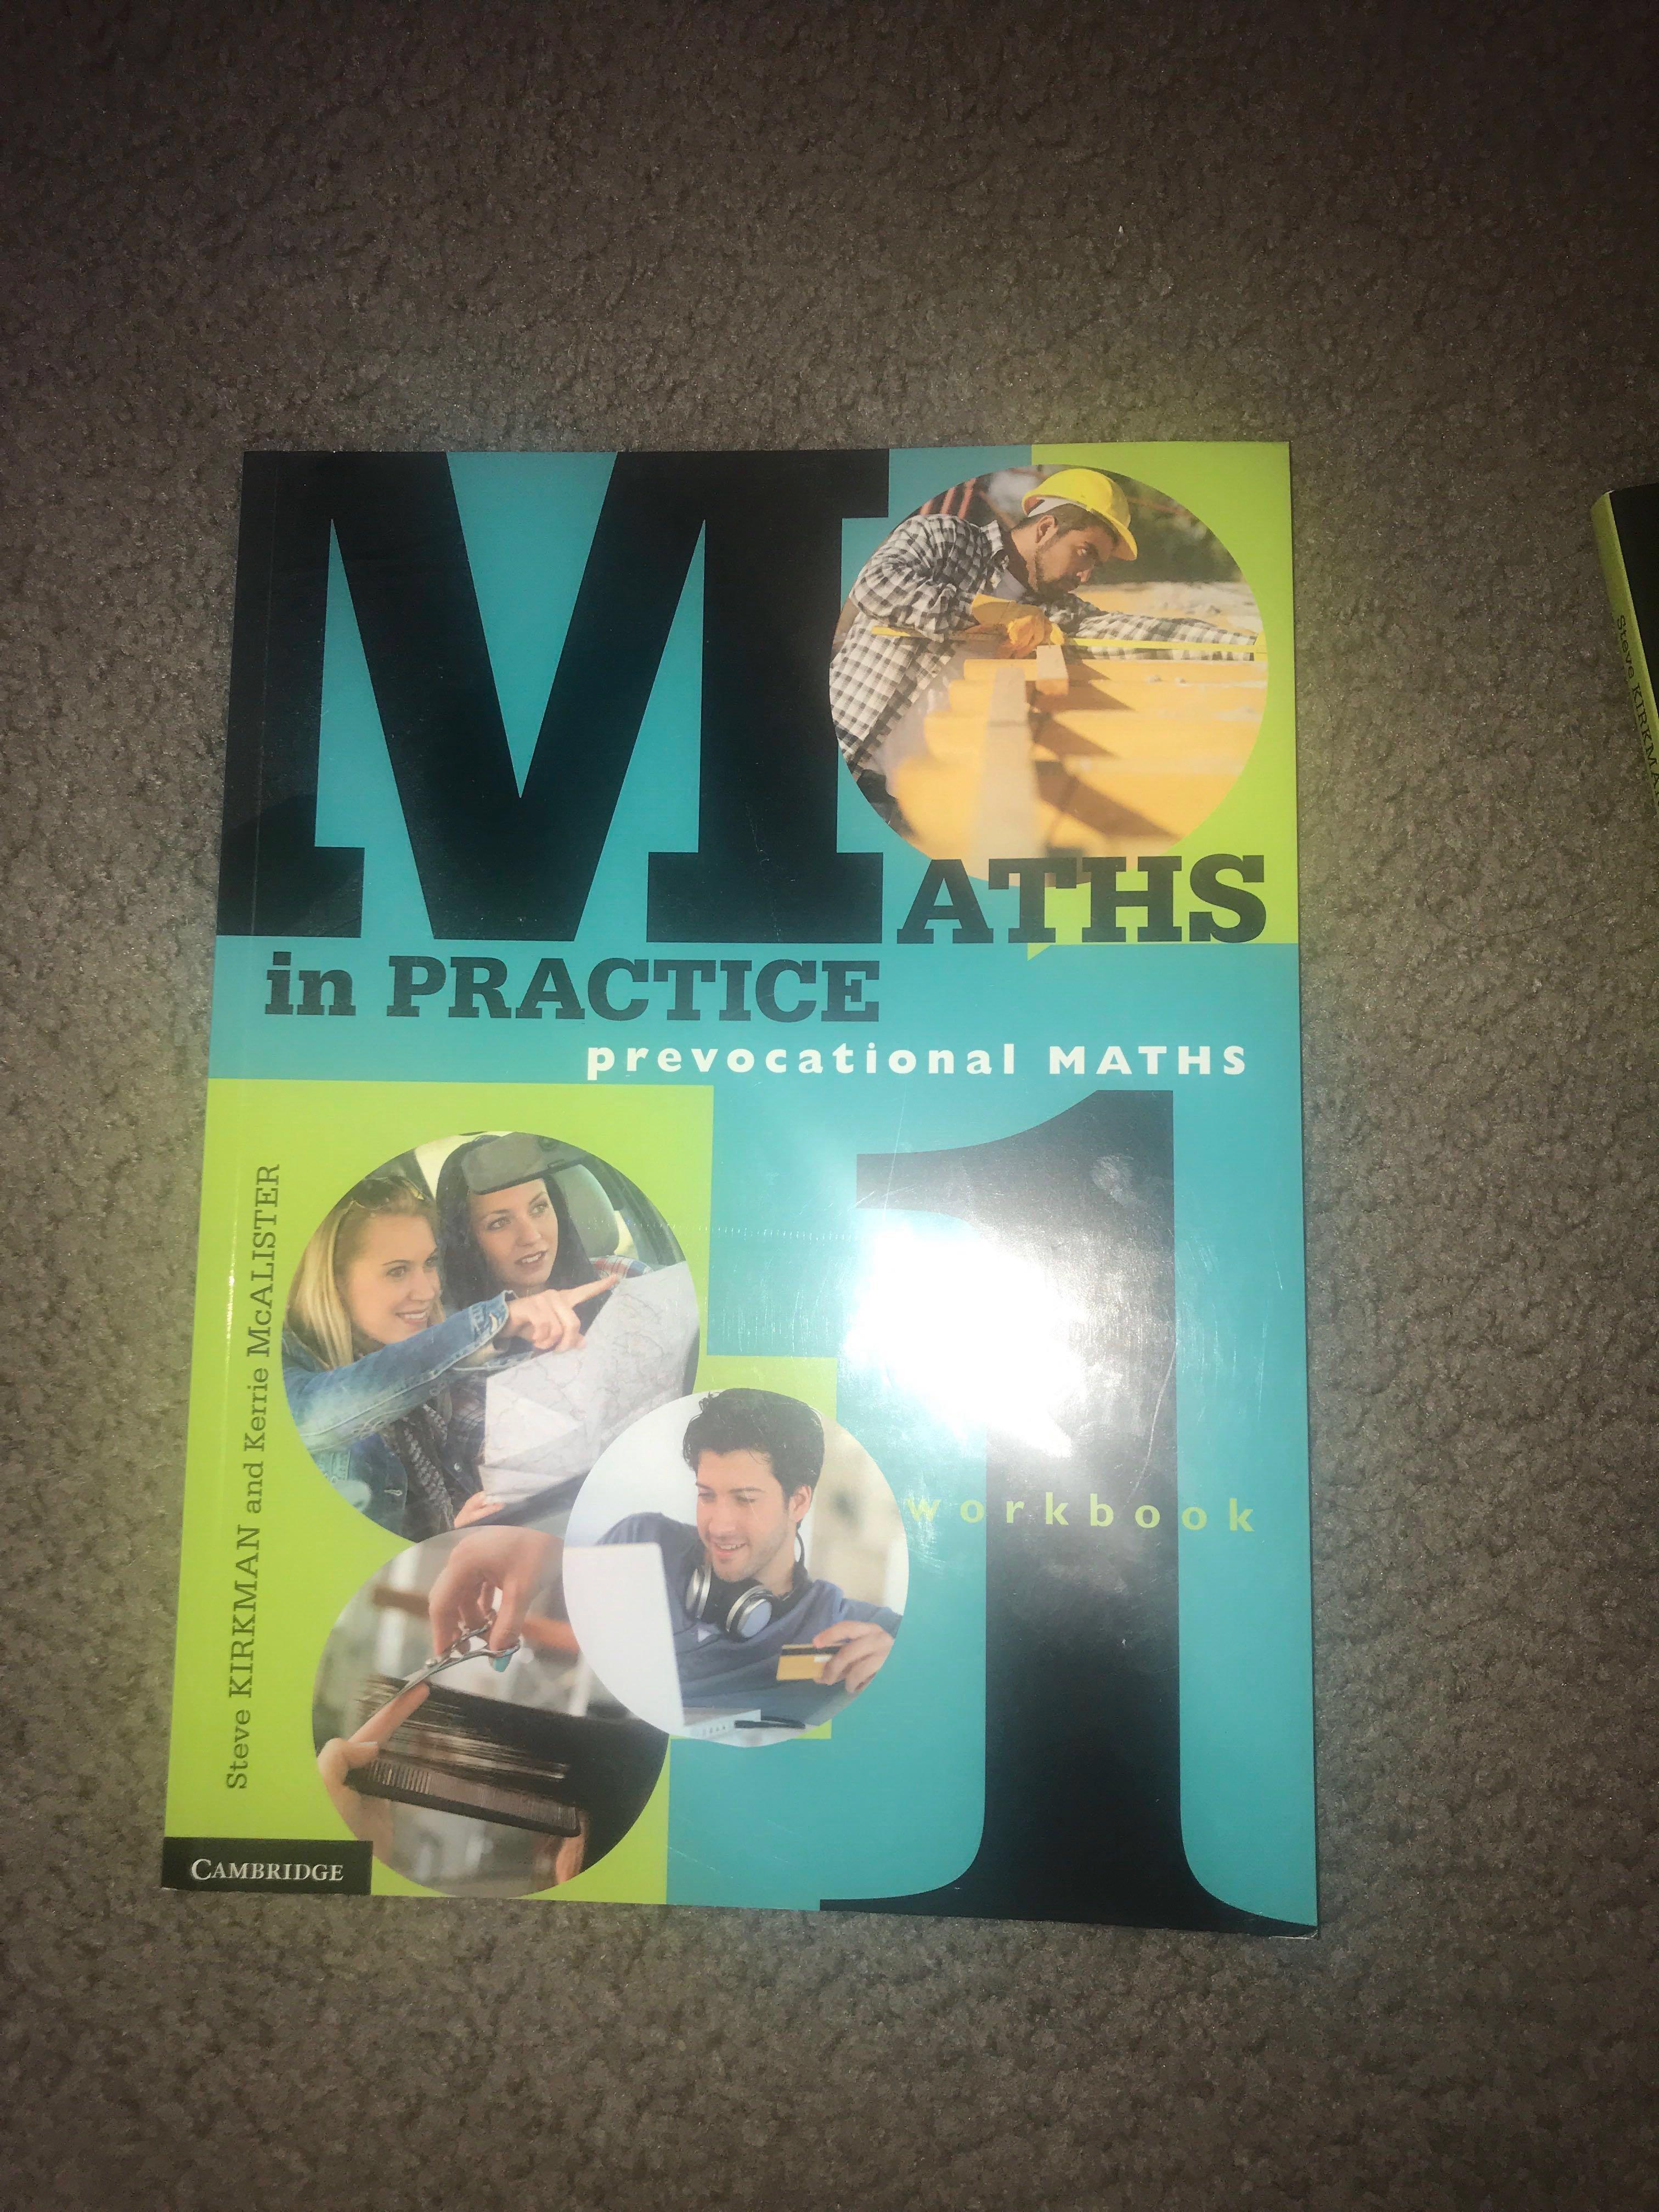 Maths In Practice Prevocational Maths Work book 1&2  ( Cambridge)